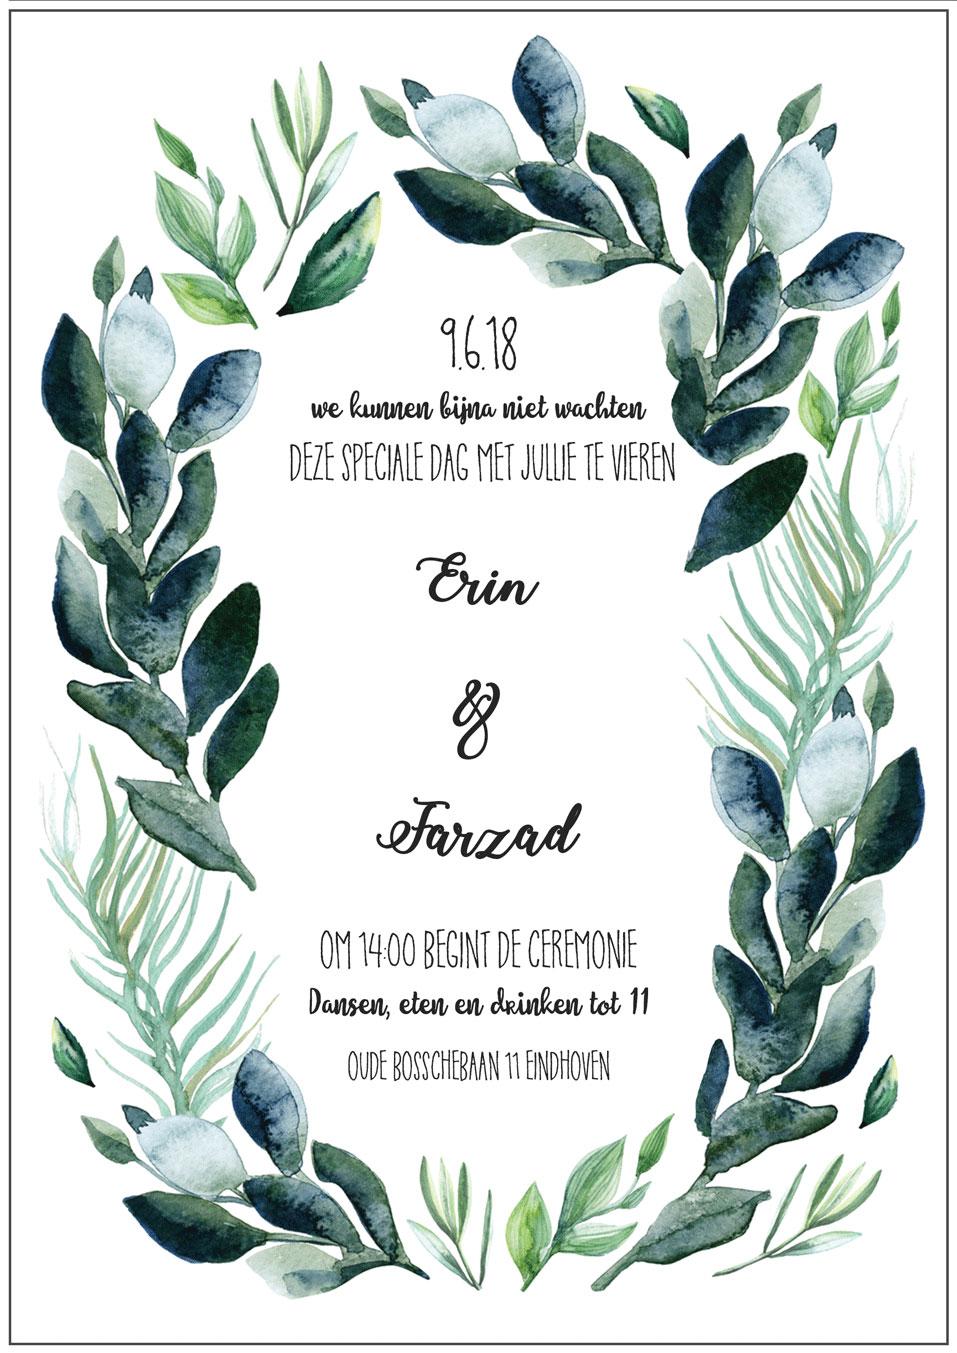 Scott Ruigrok - Freelance - wedding invite